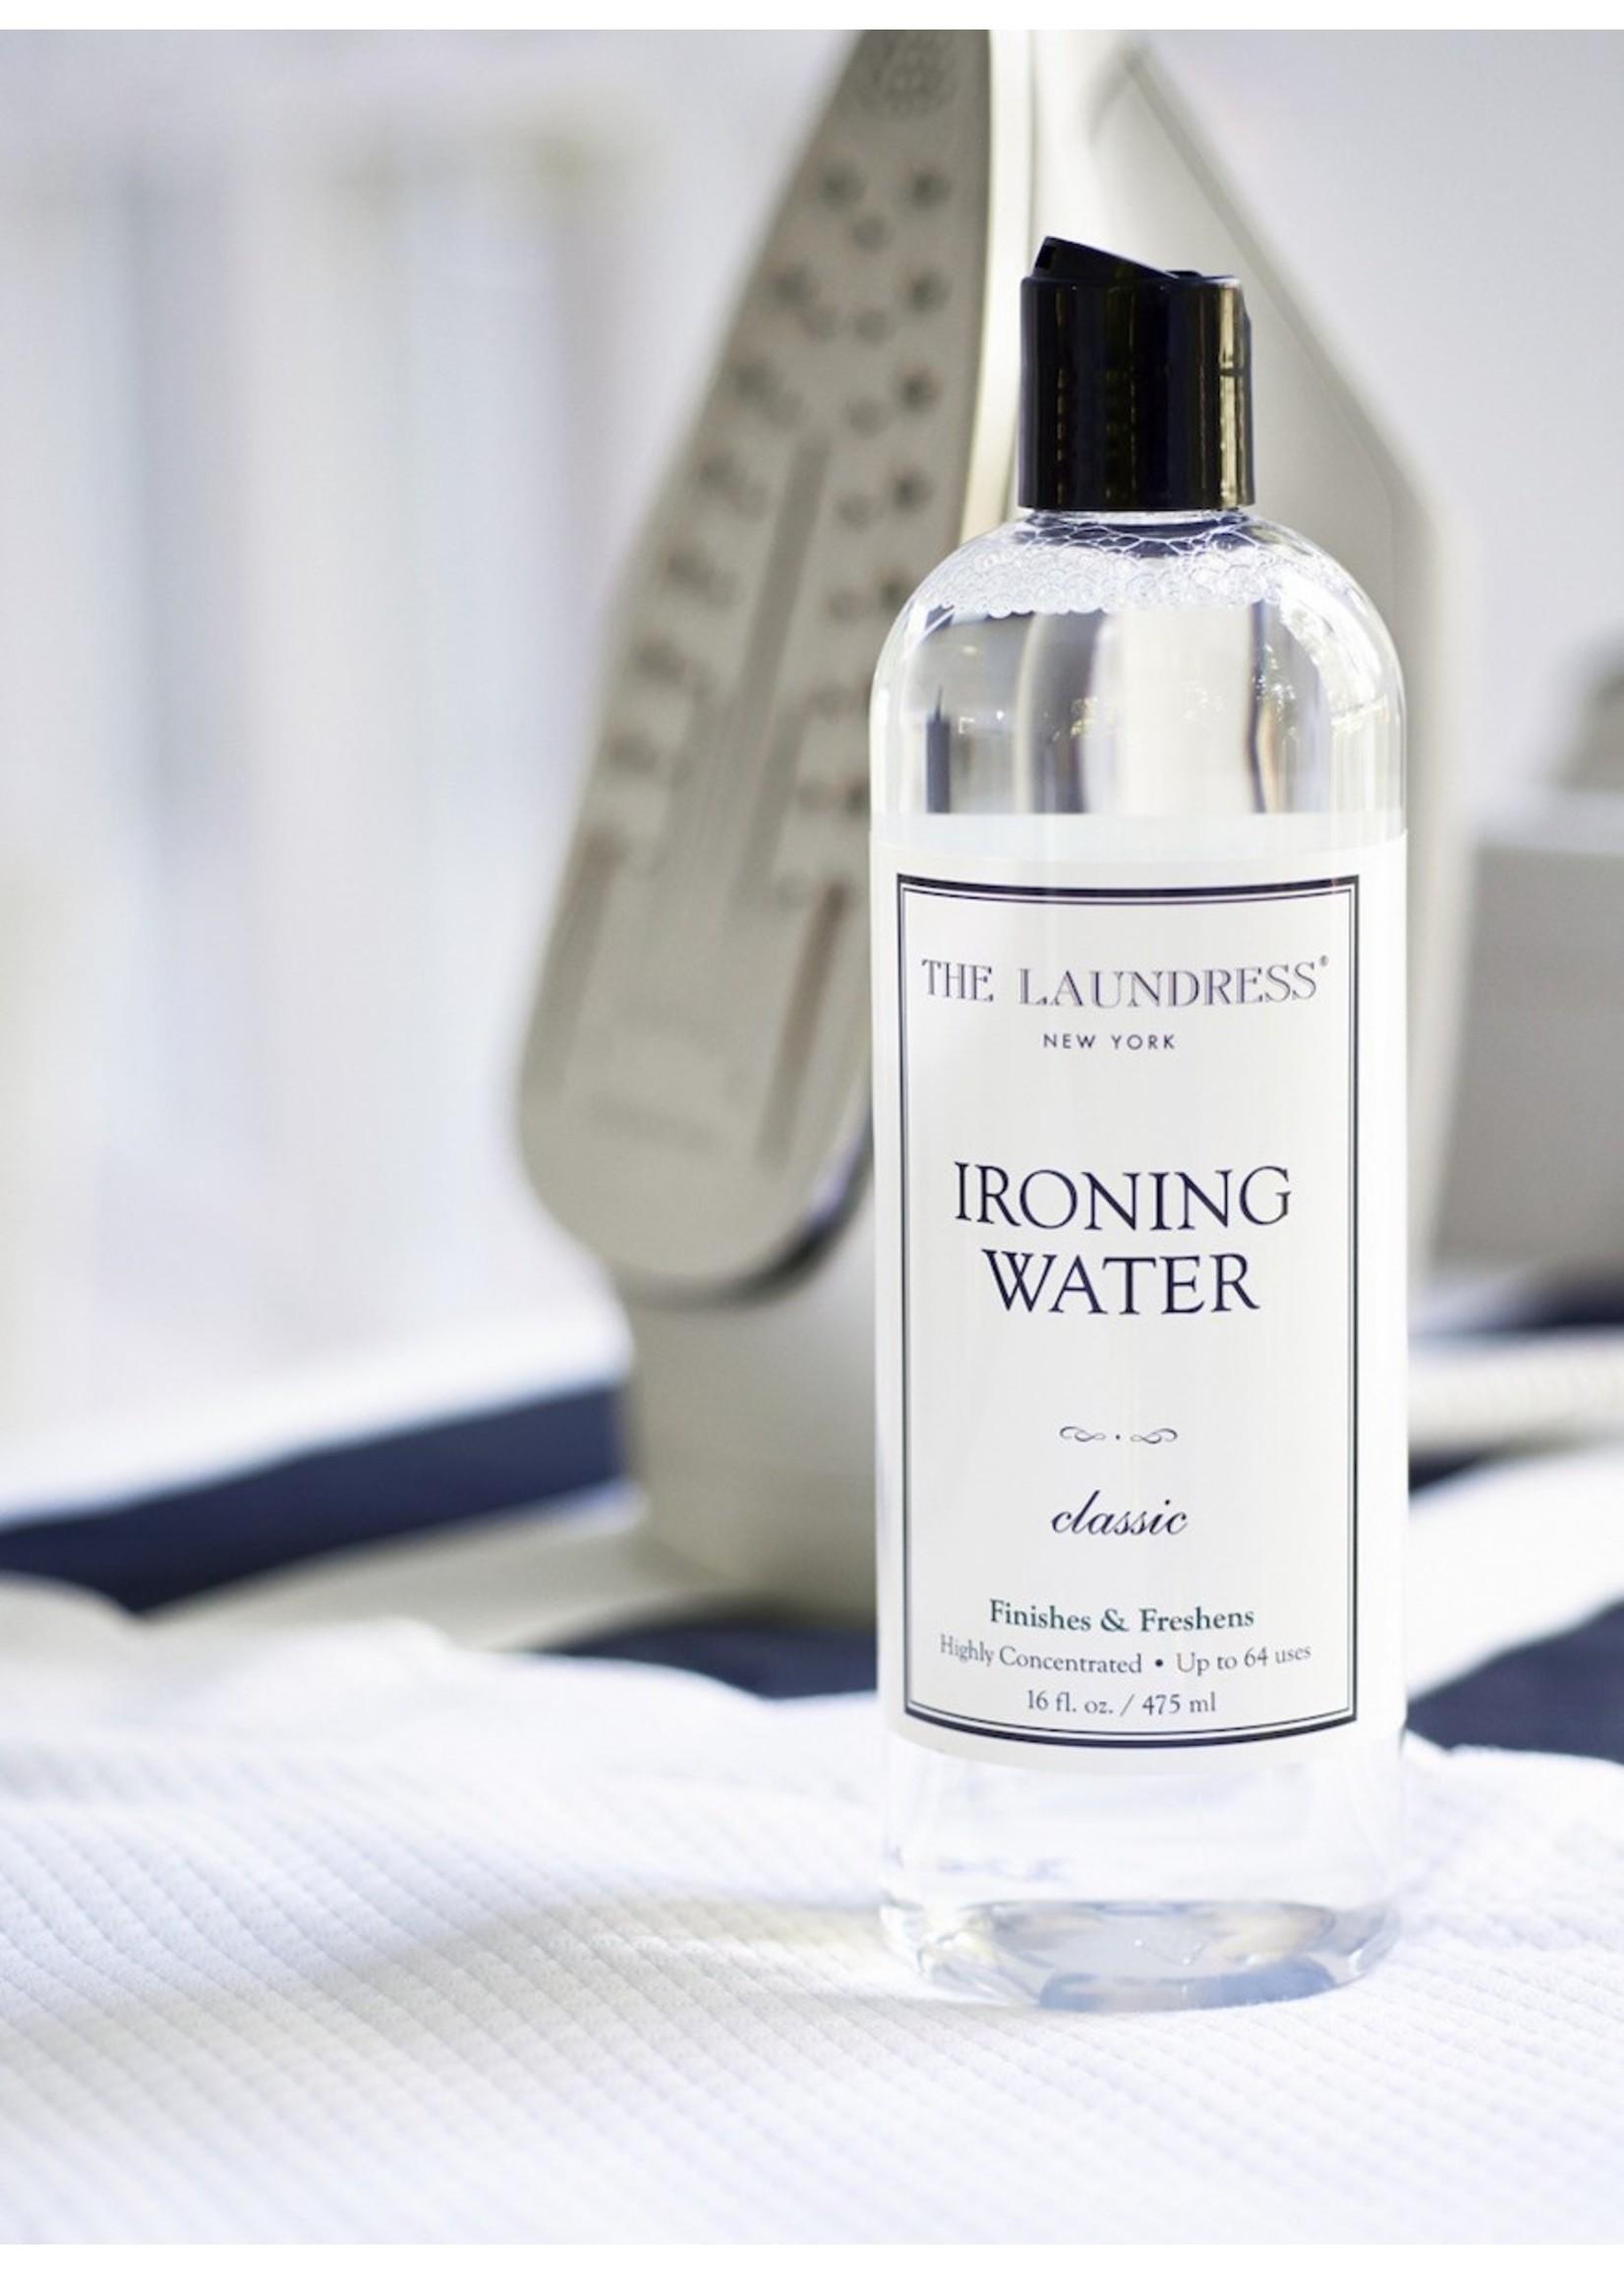 The Laundress New York Ironing Water